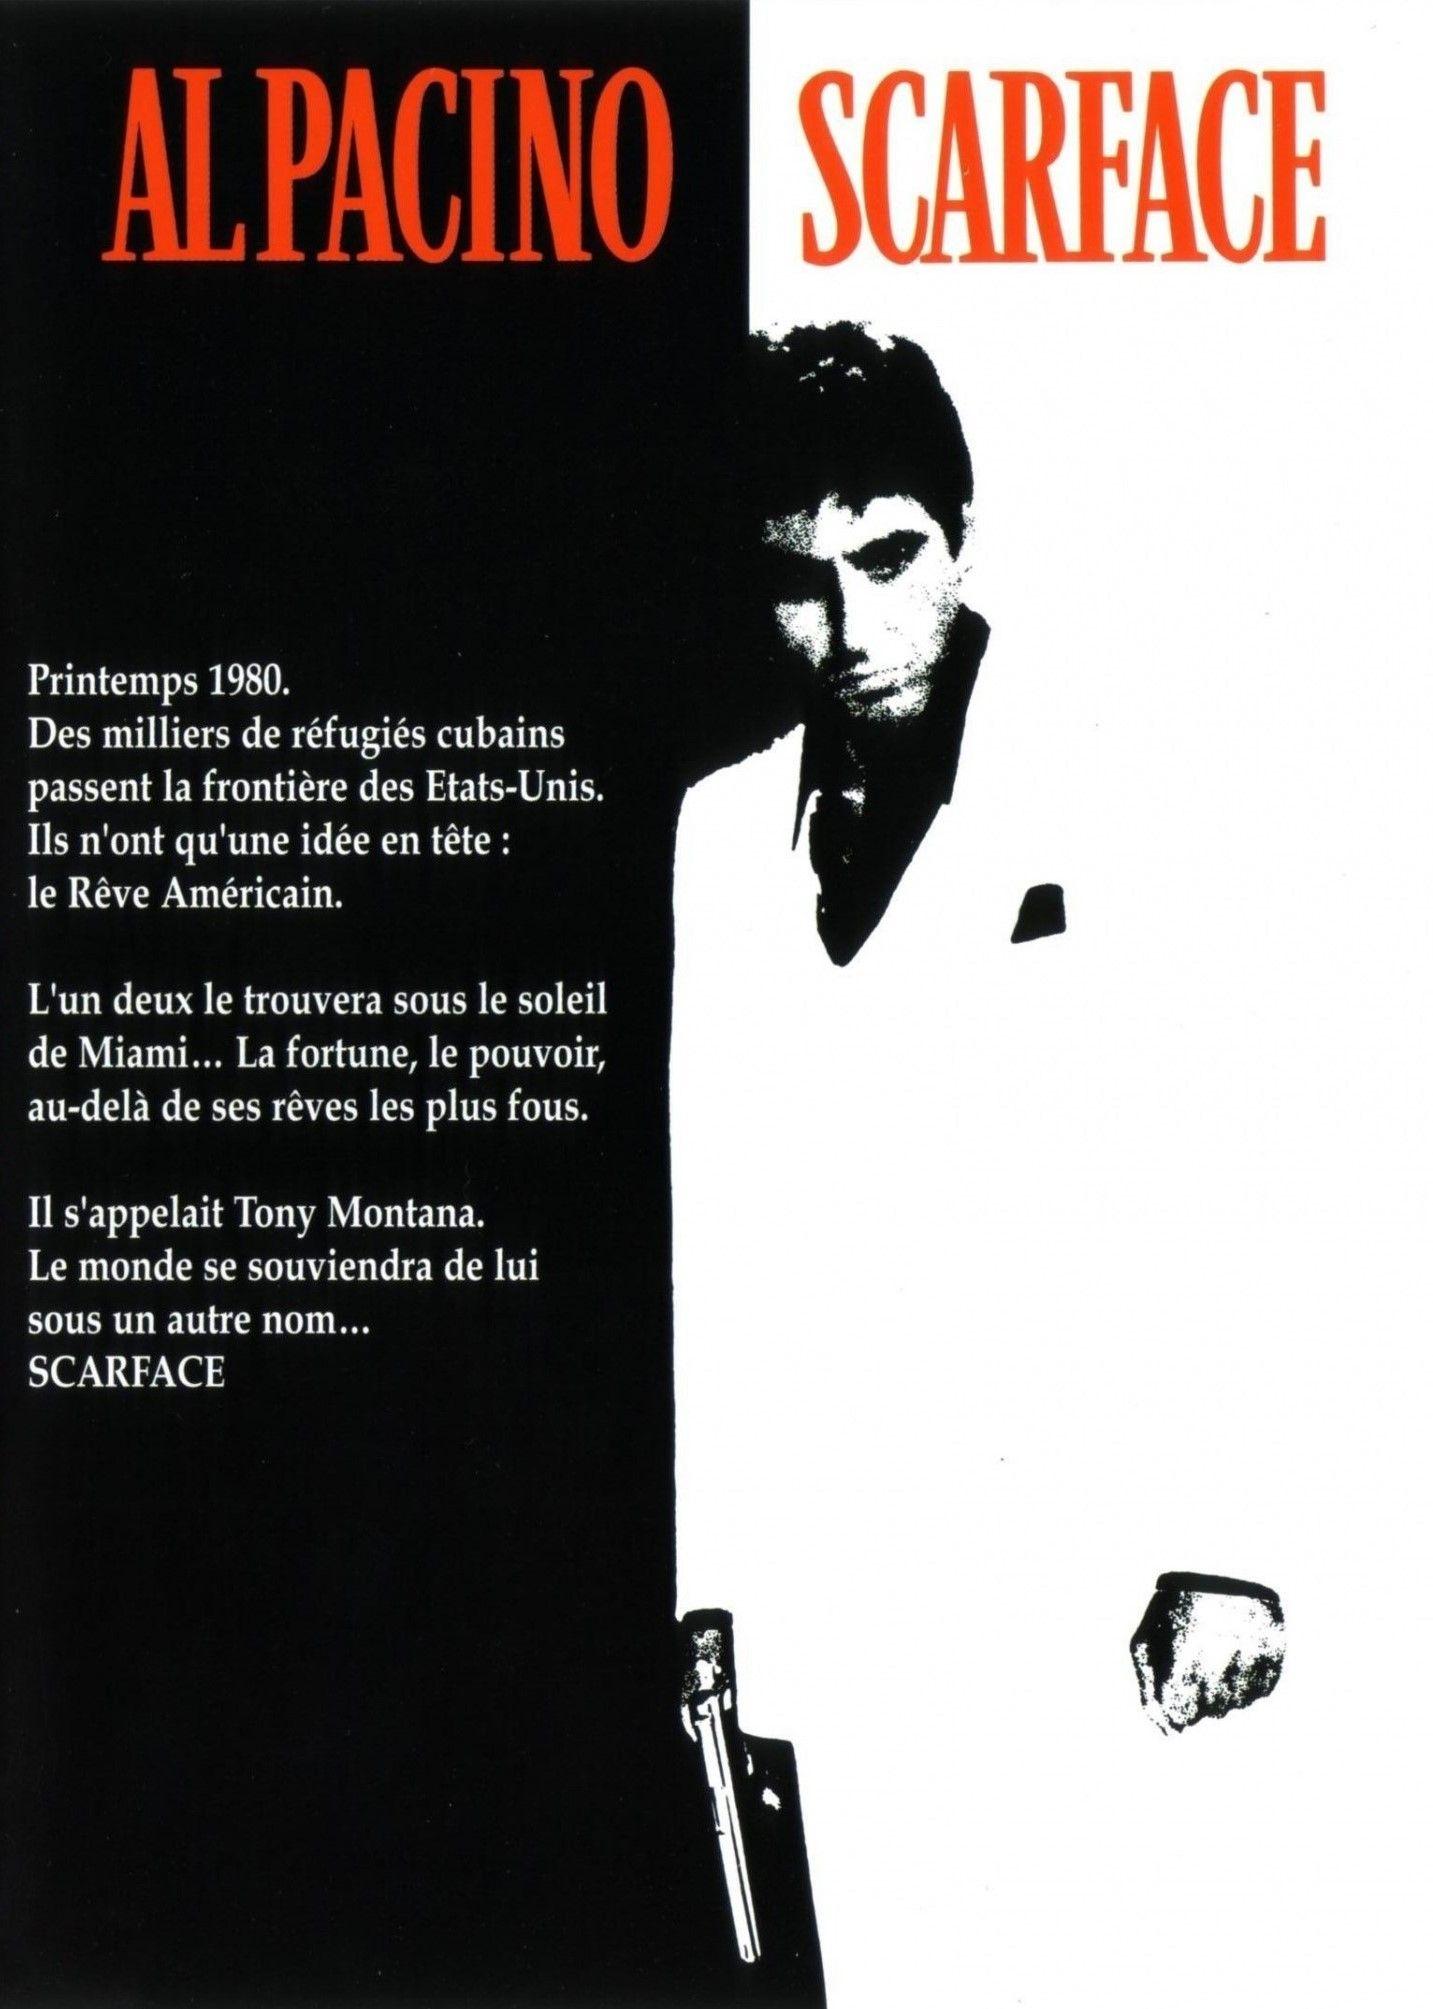 Scarface [1983] Scarface